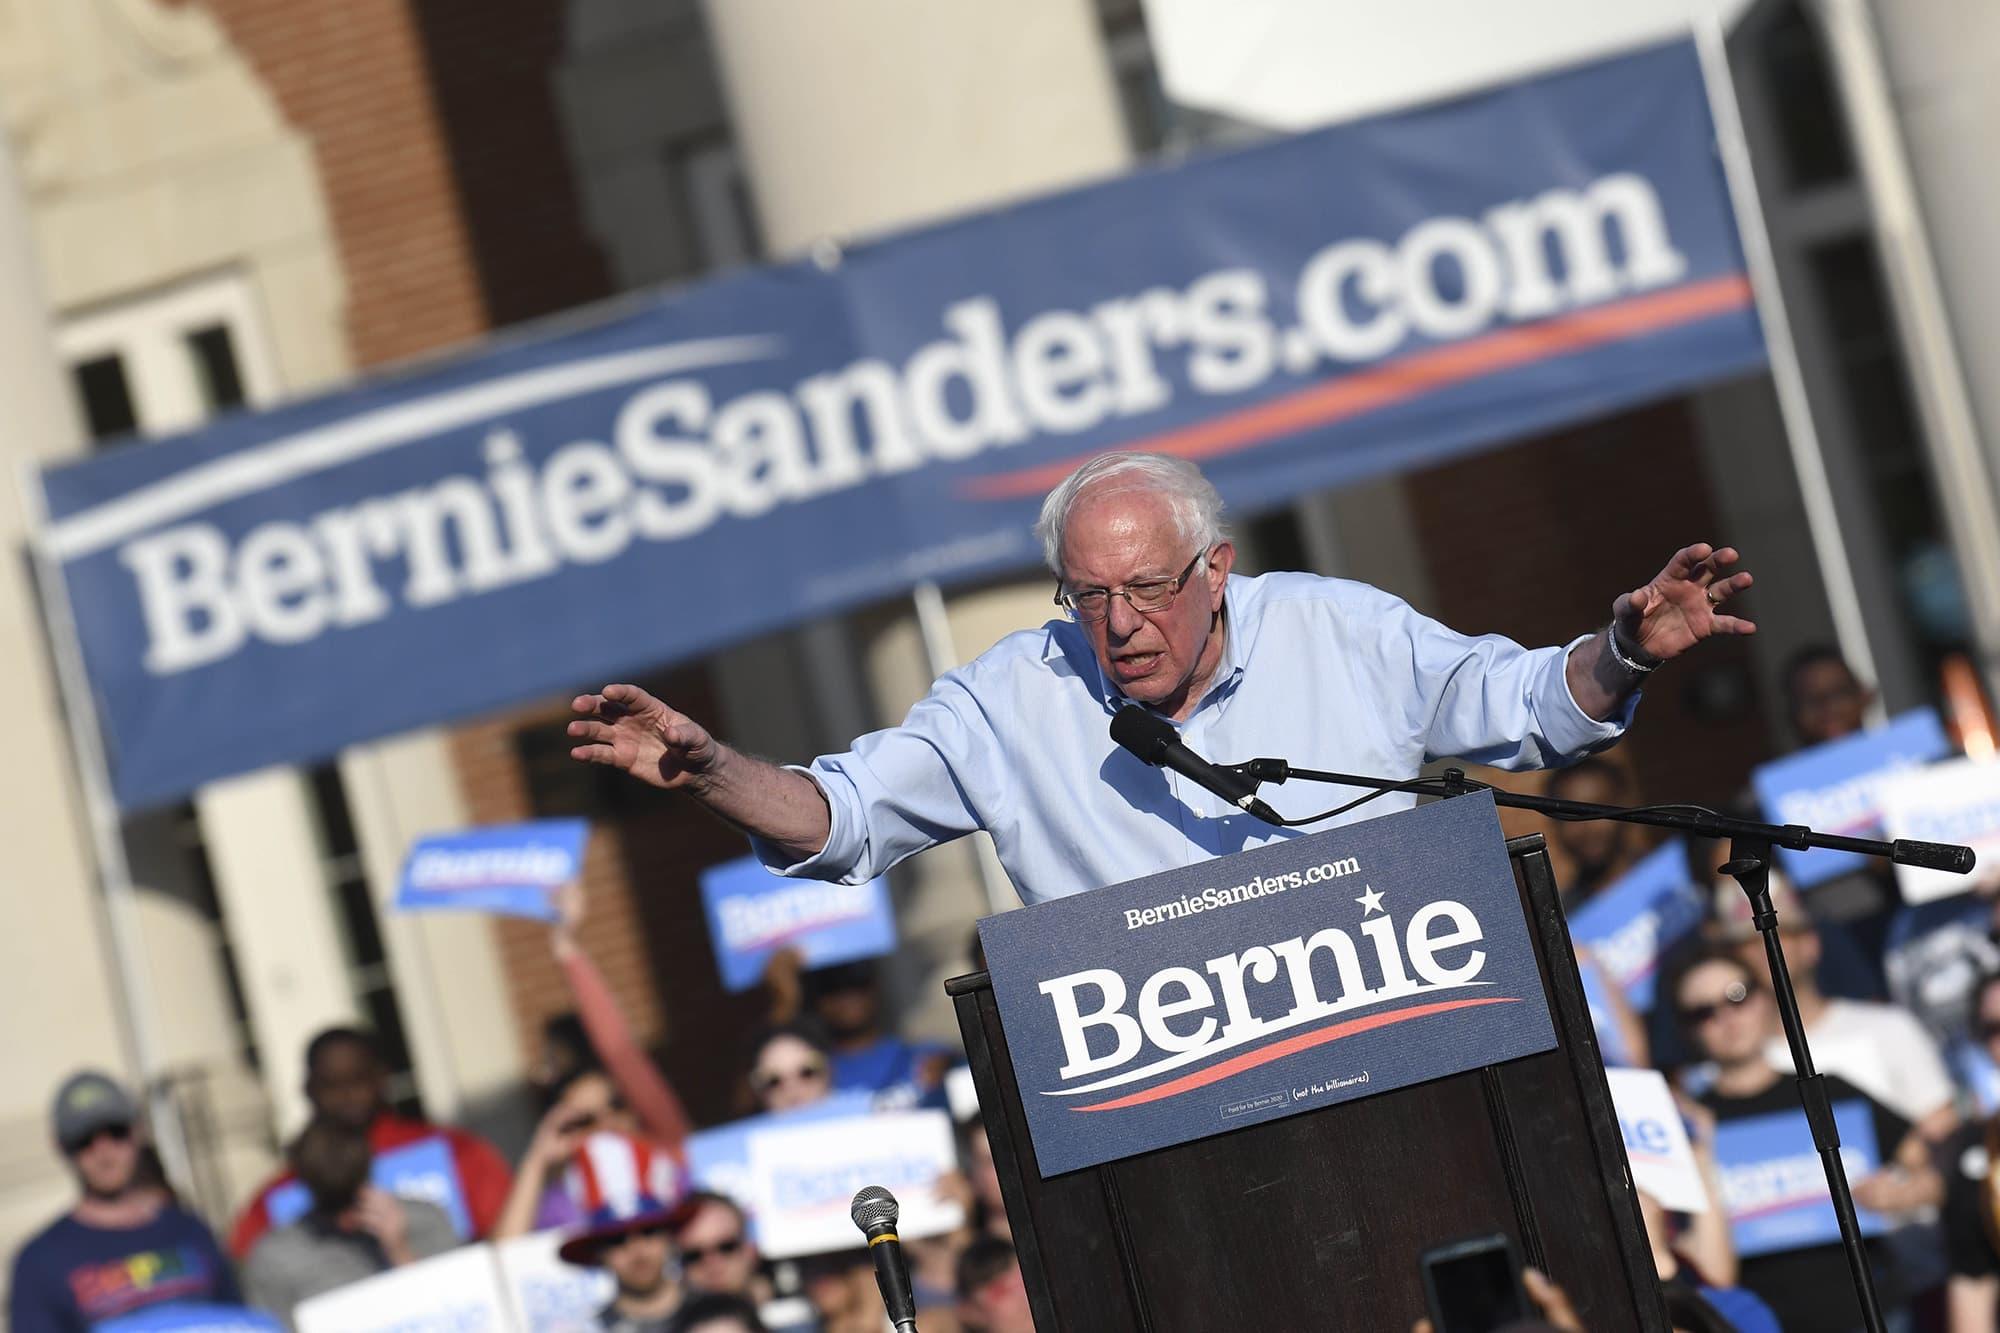 Bernie Sanders' tax returns reveal his income ahead of 2020